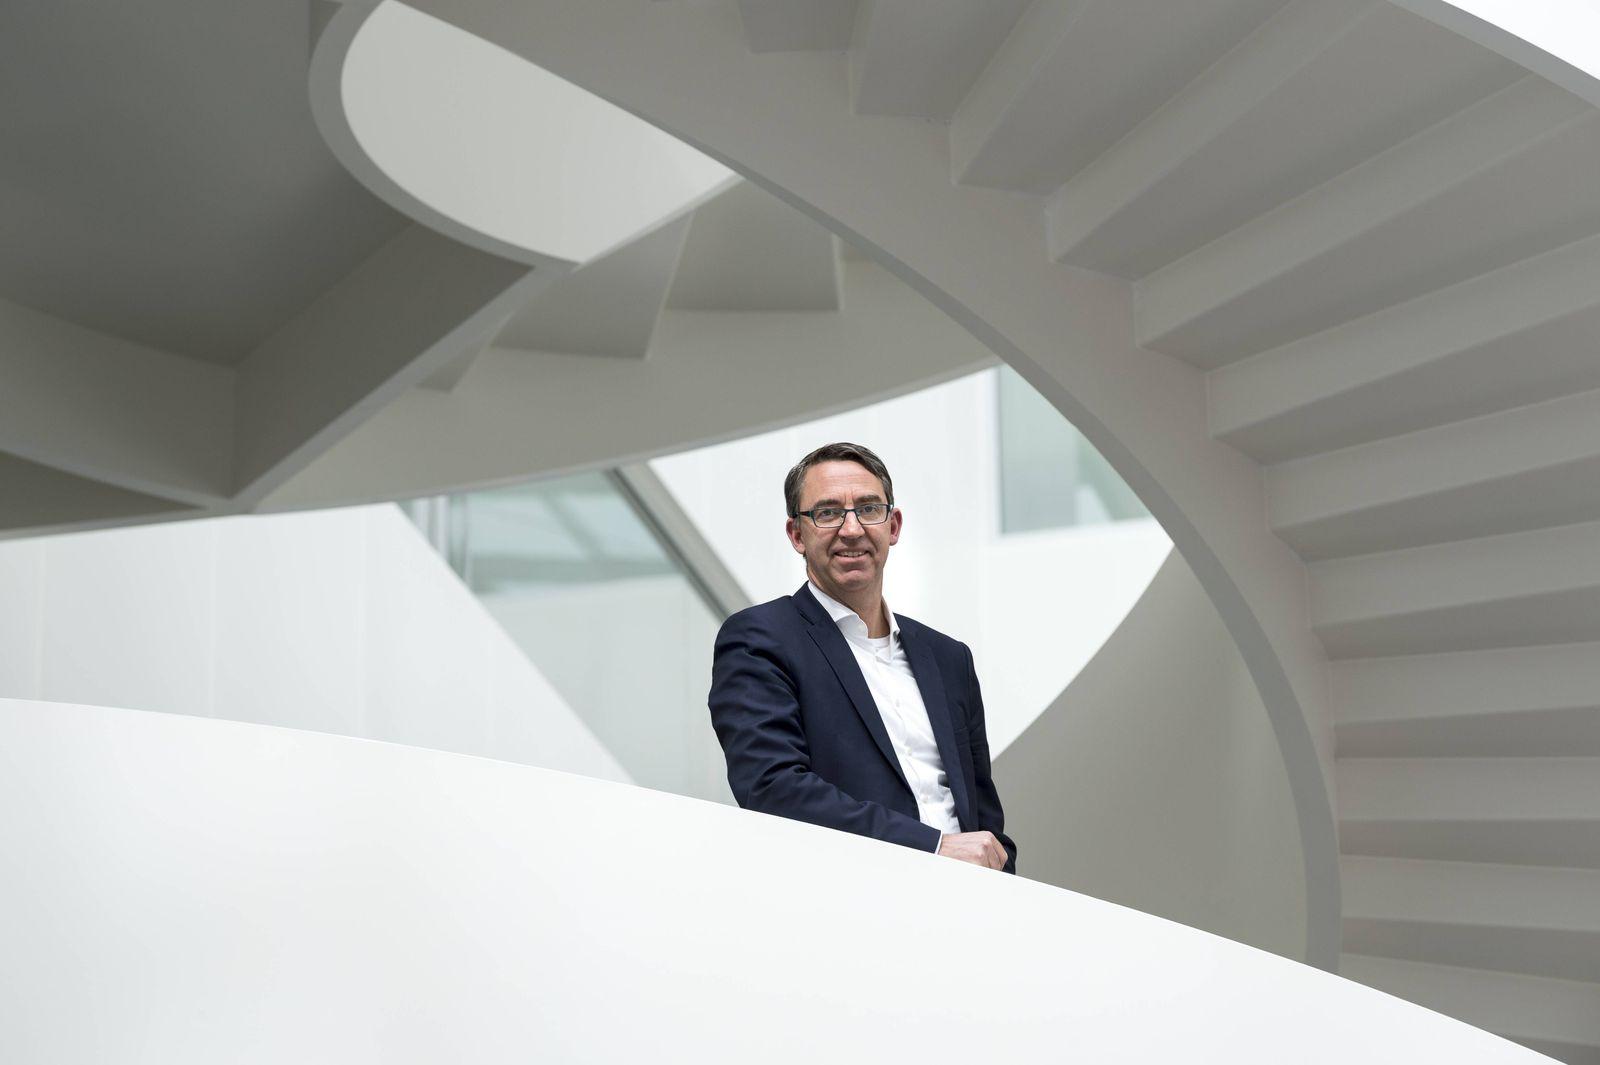 KUKA Bilanzpressekonferenz der KUKA AG Dr Till Reuter Vorstandsvorsitzender Augsburg Bayern Deu